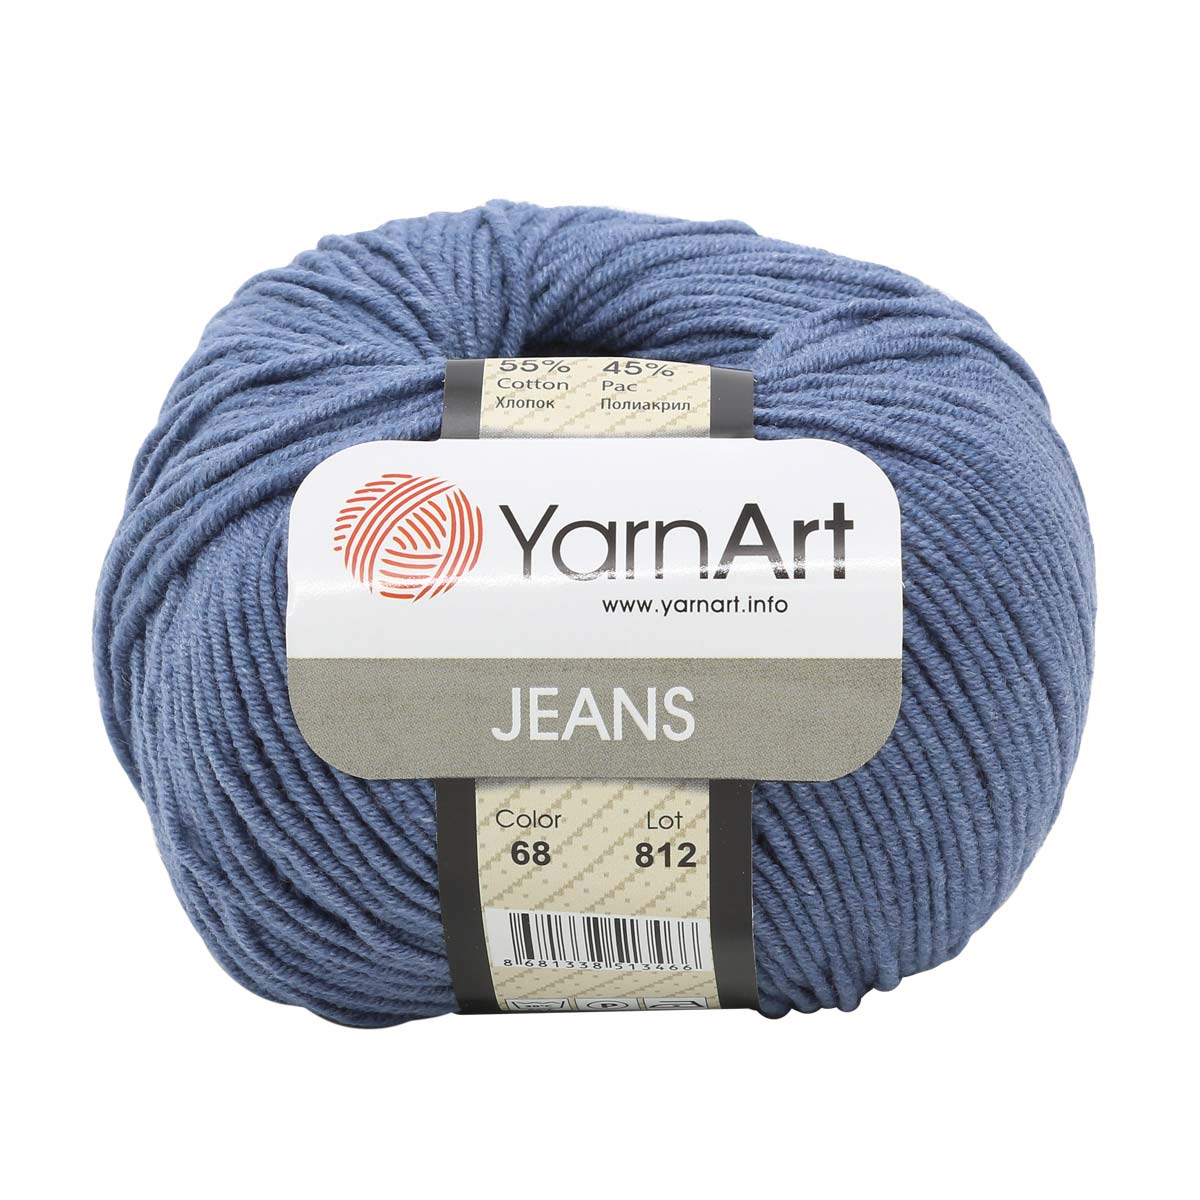 Пряжа YarnArt 'Jeans' 50гр. 160м. (55%хлопок, 45%ПАК)